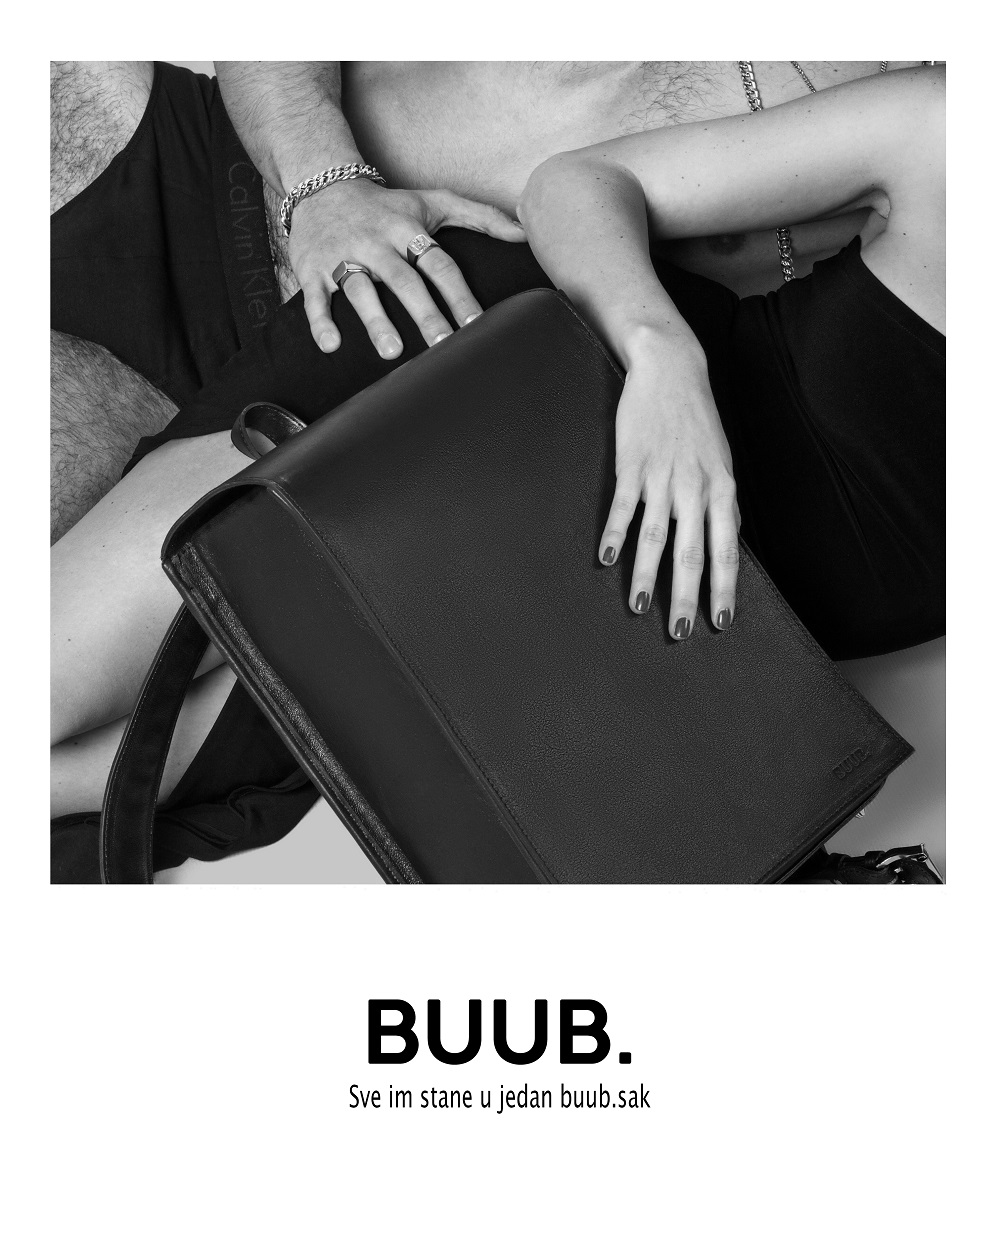 BUUB 2020 (4)